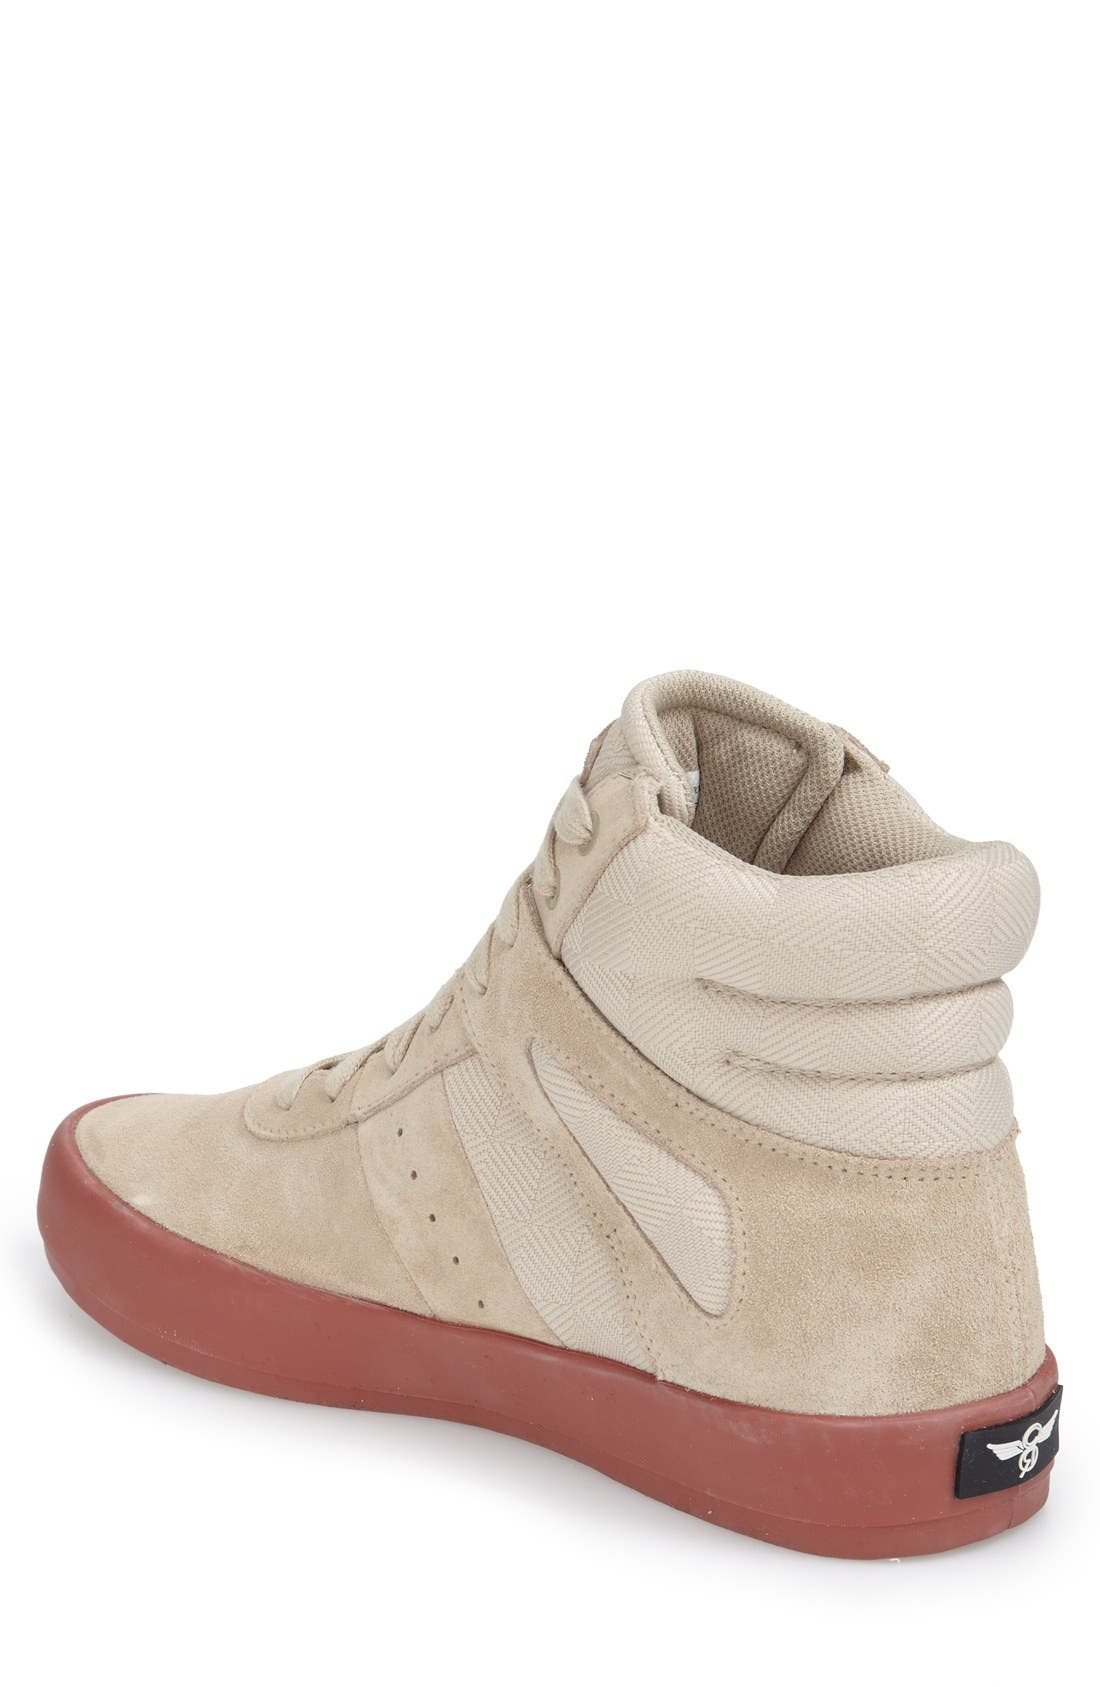 'Moretti' Sneaker,                             Alternate thumbnail 6, color,